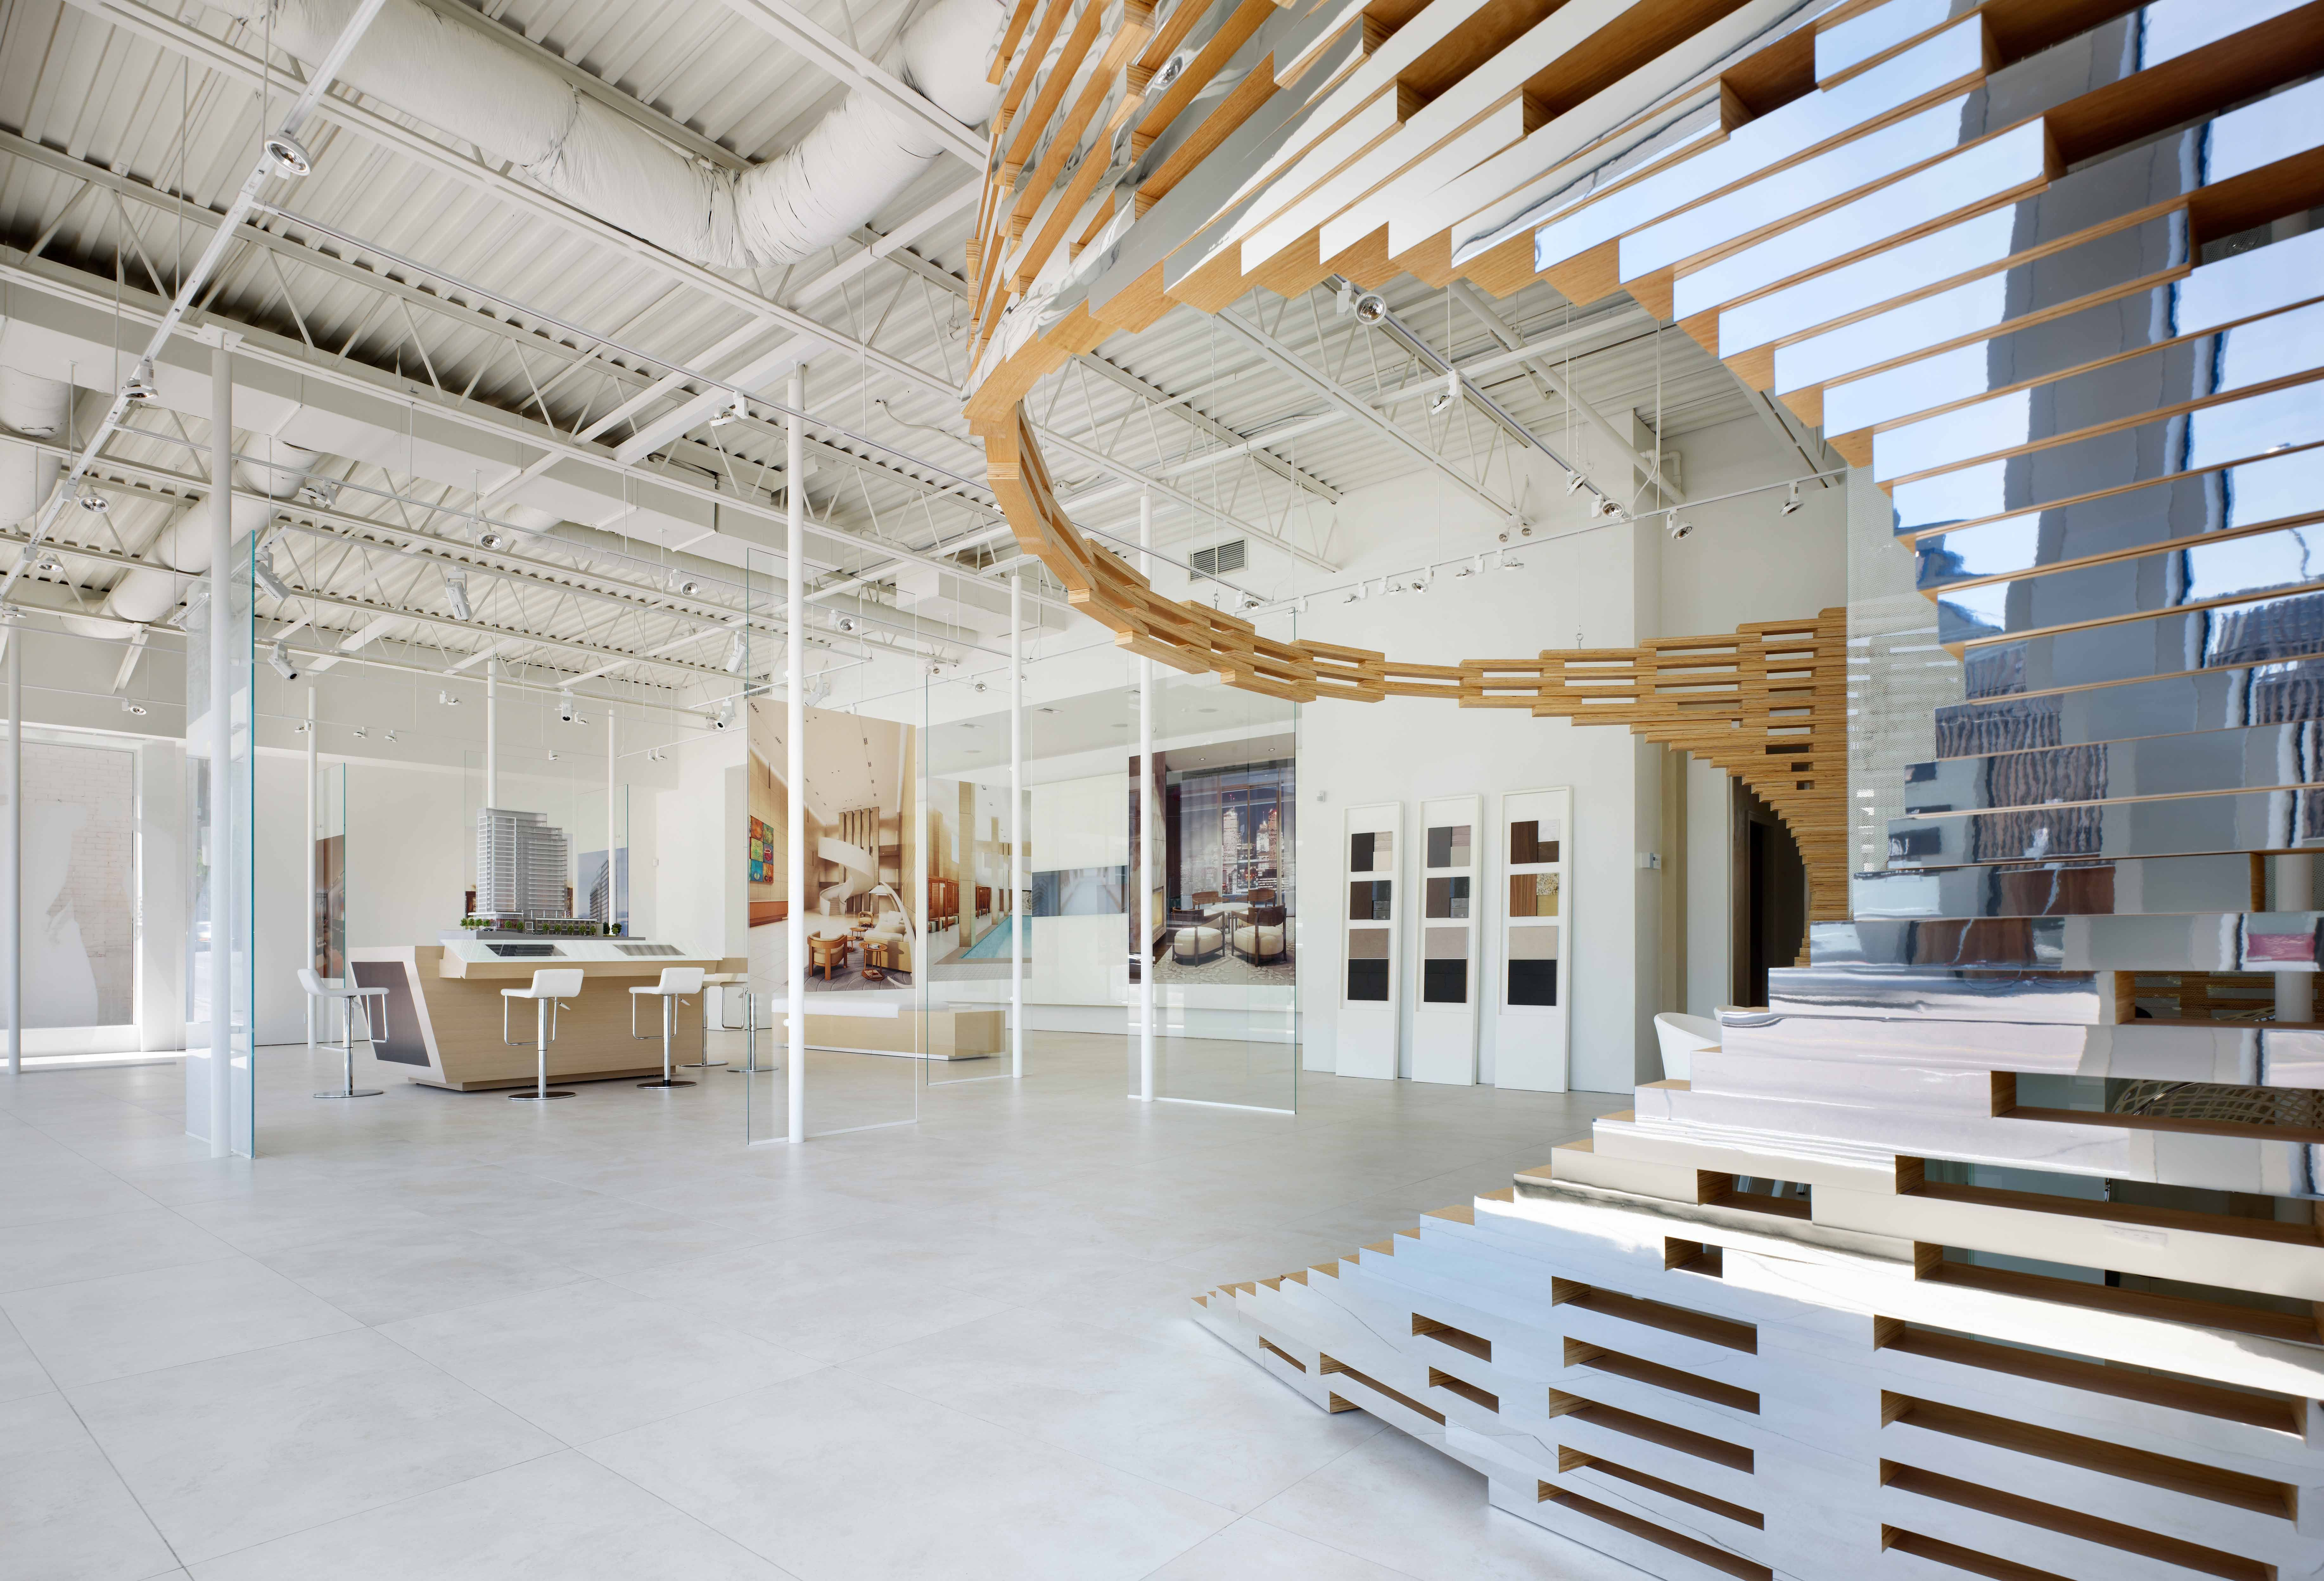 Toronto, Canada. Designed by Studio Munge. Developer: Menkes Developments.